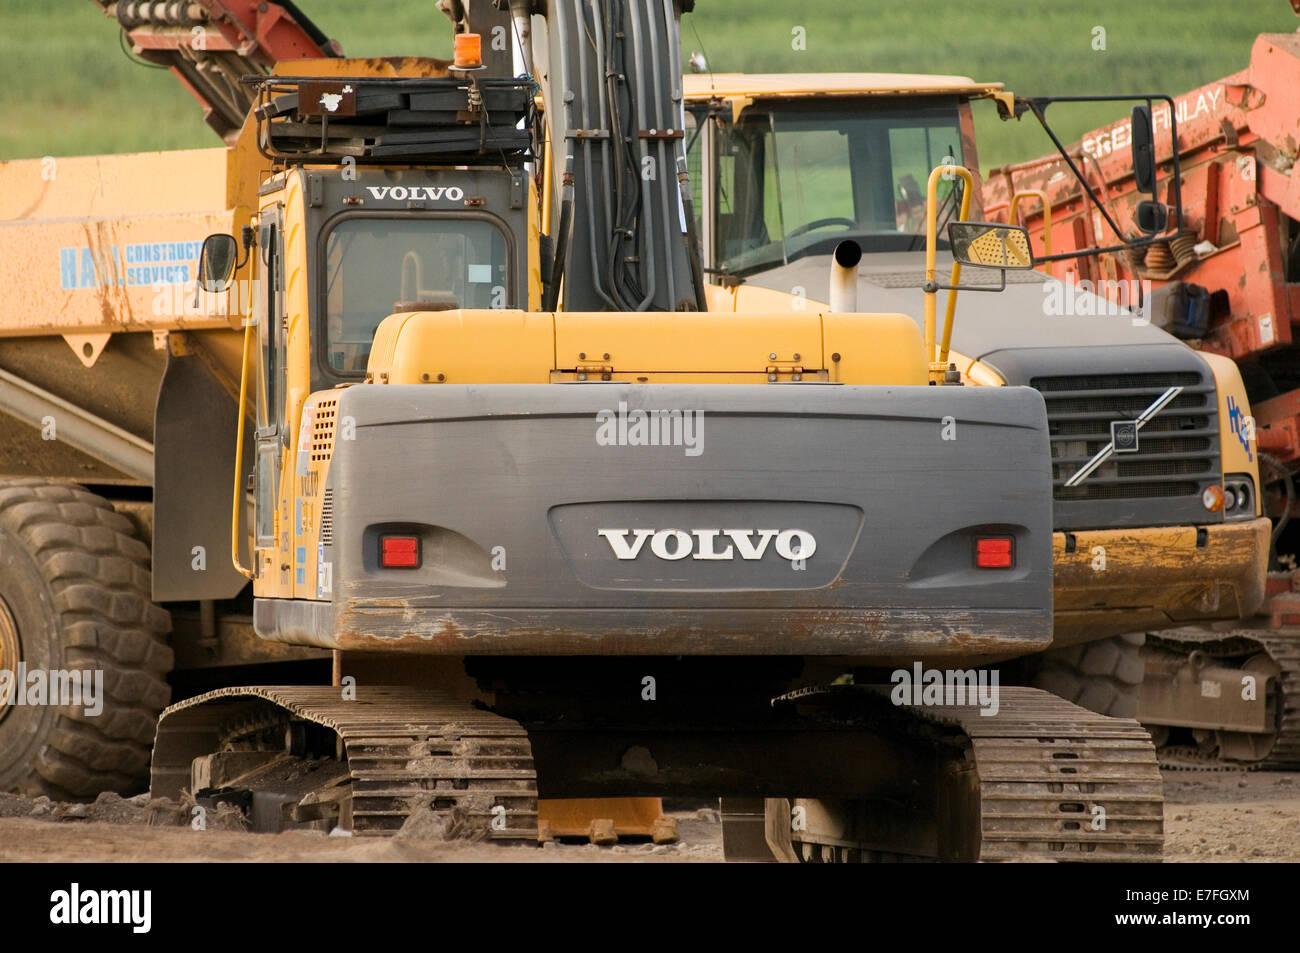 Volvo excavator factory in Kaluga 21